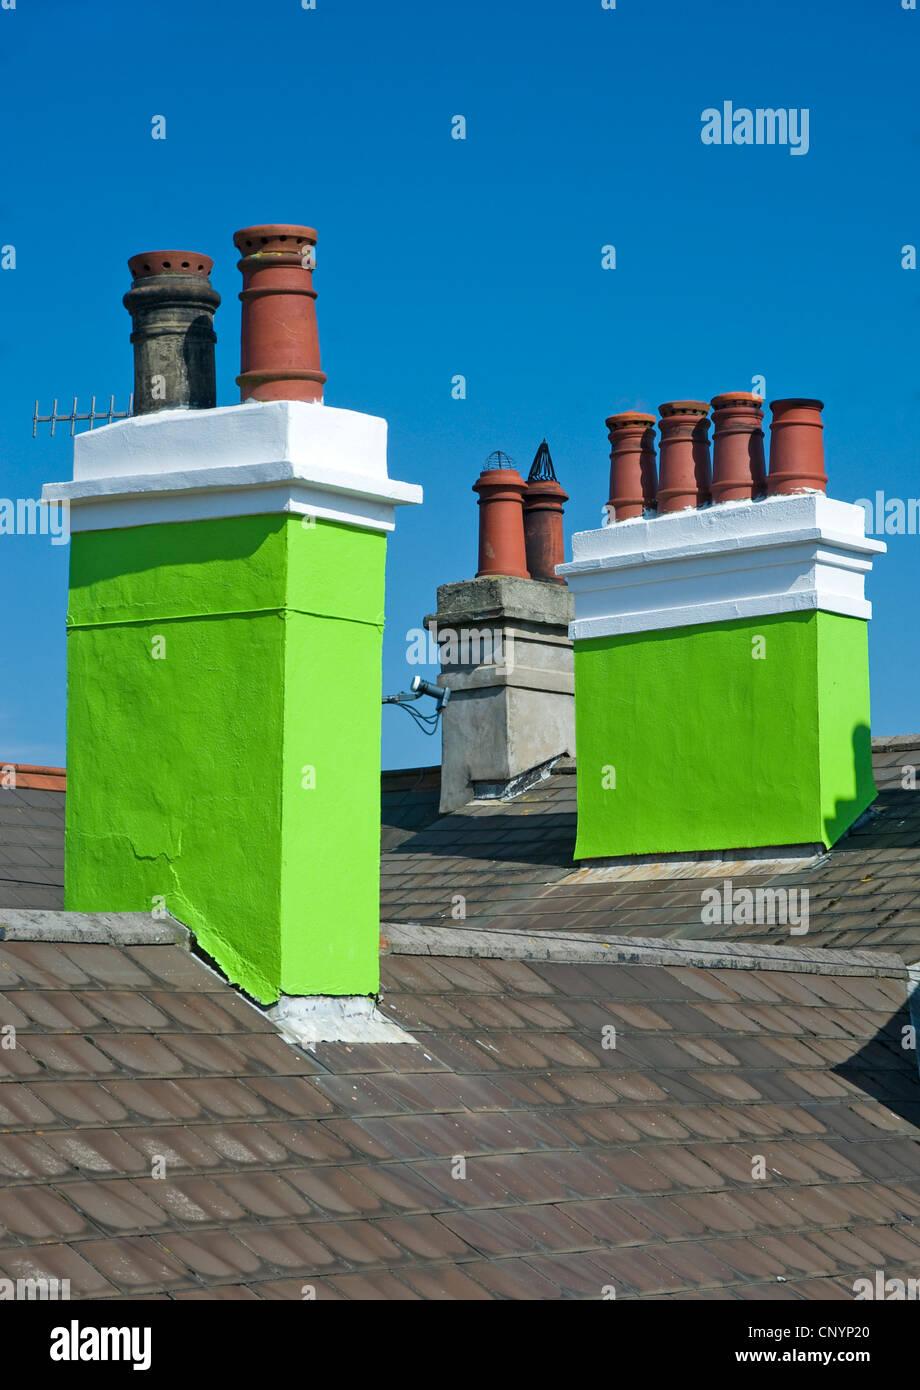 Green chimneys in Whitehead, Northern Ireland. - Stock Image